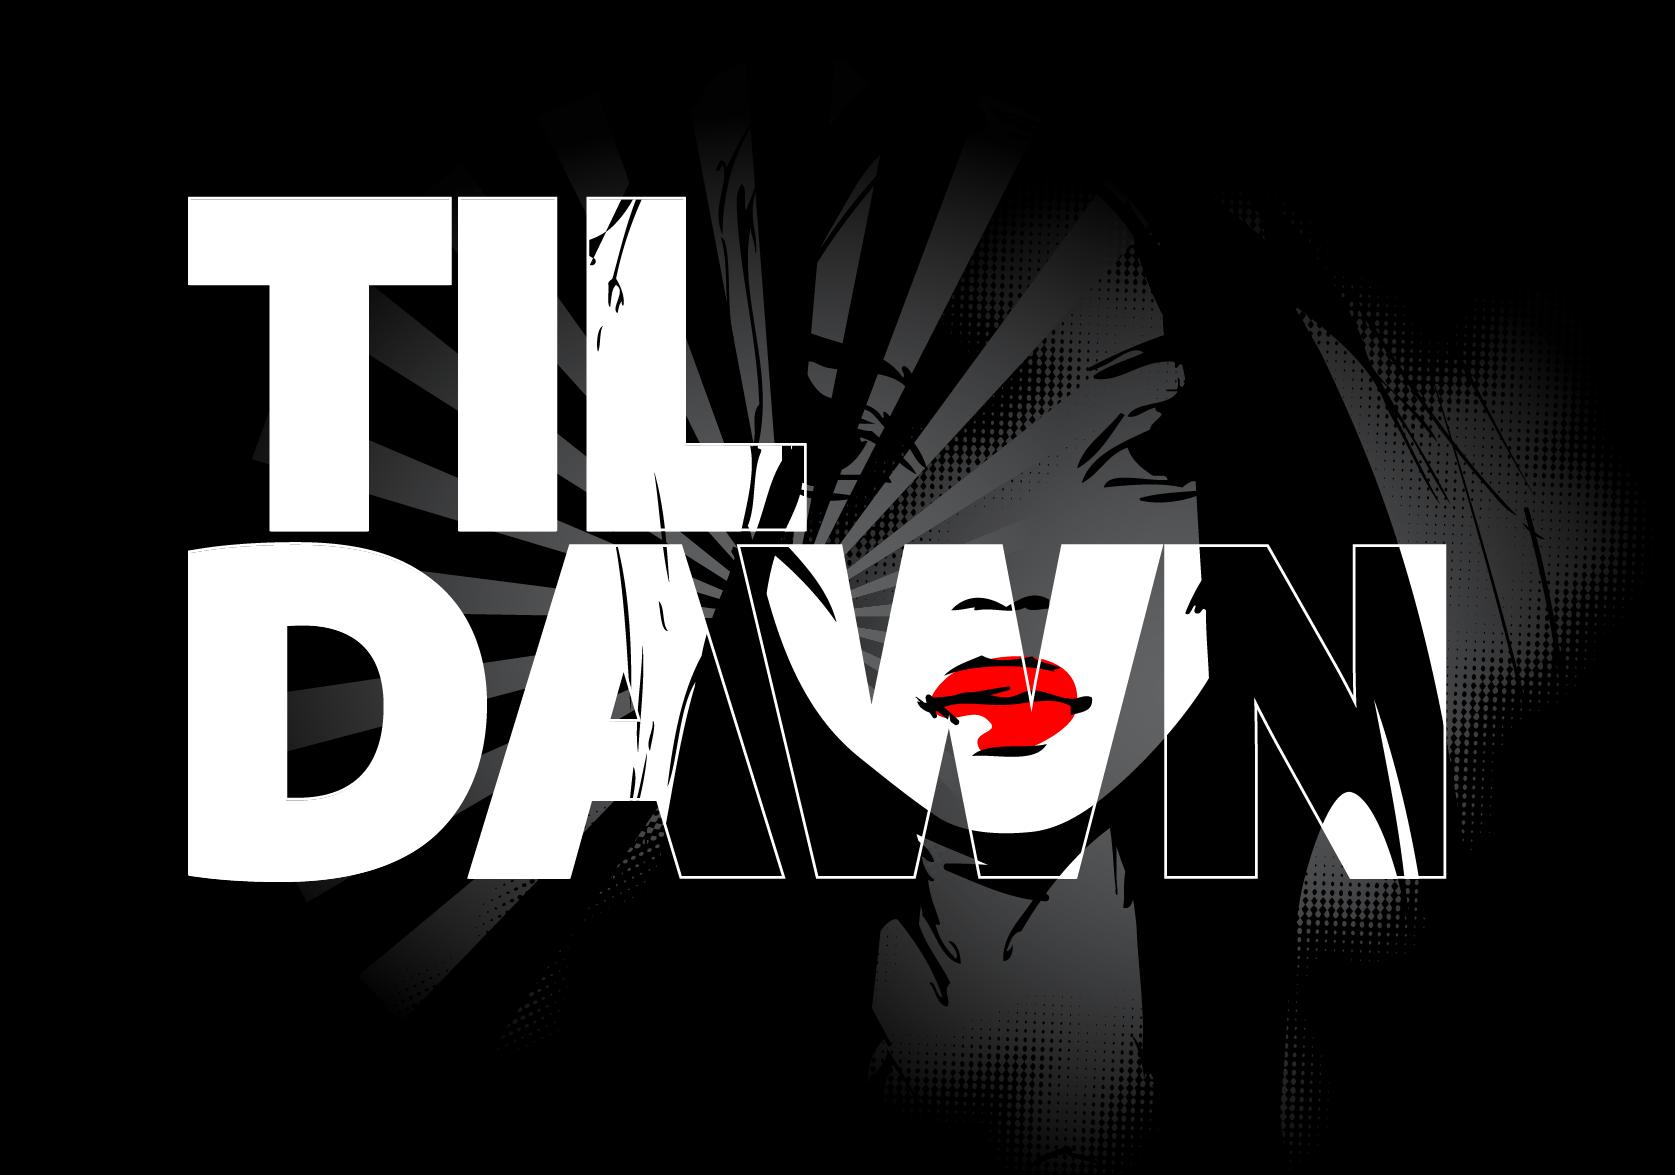 (c) Tildawn.co.uk